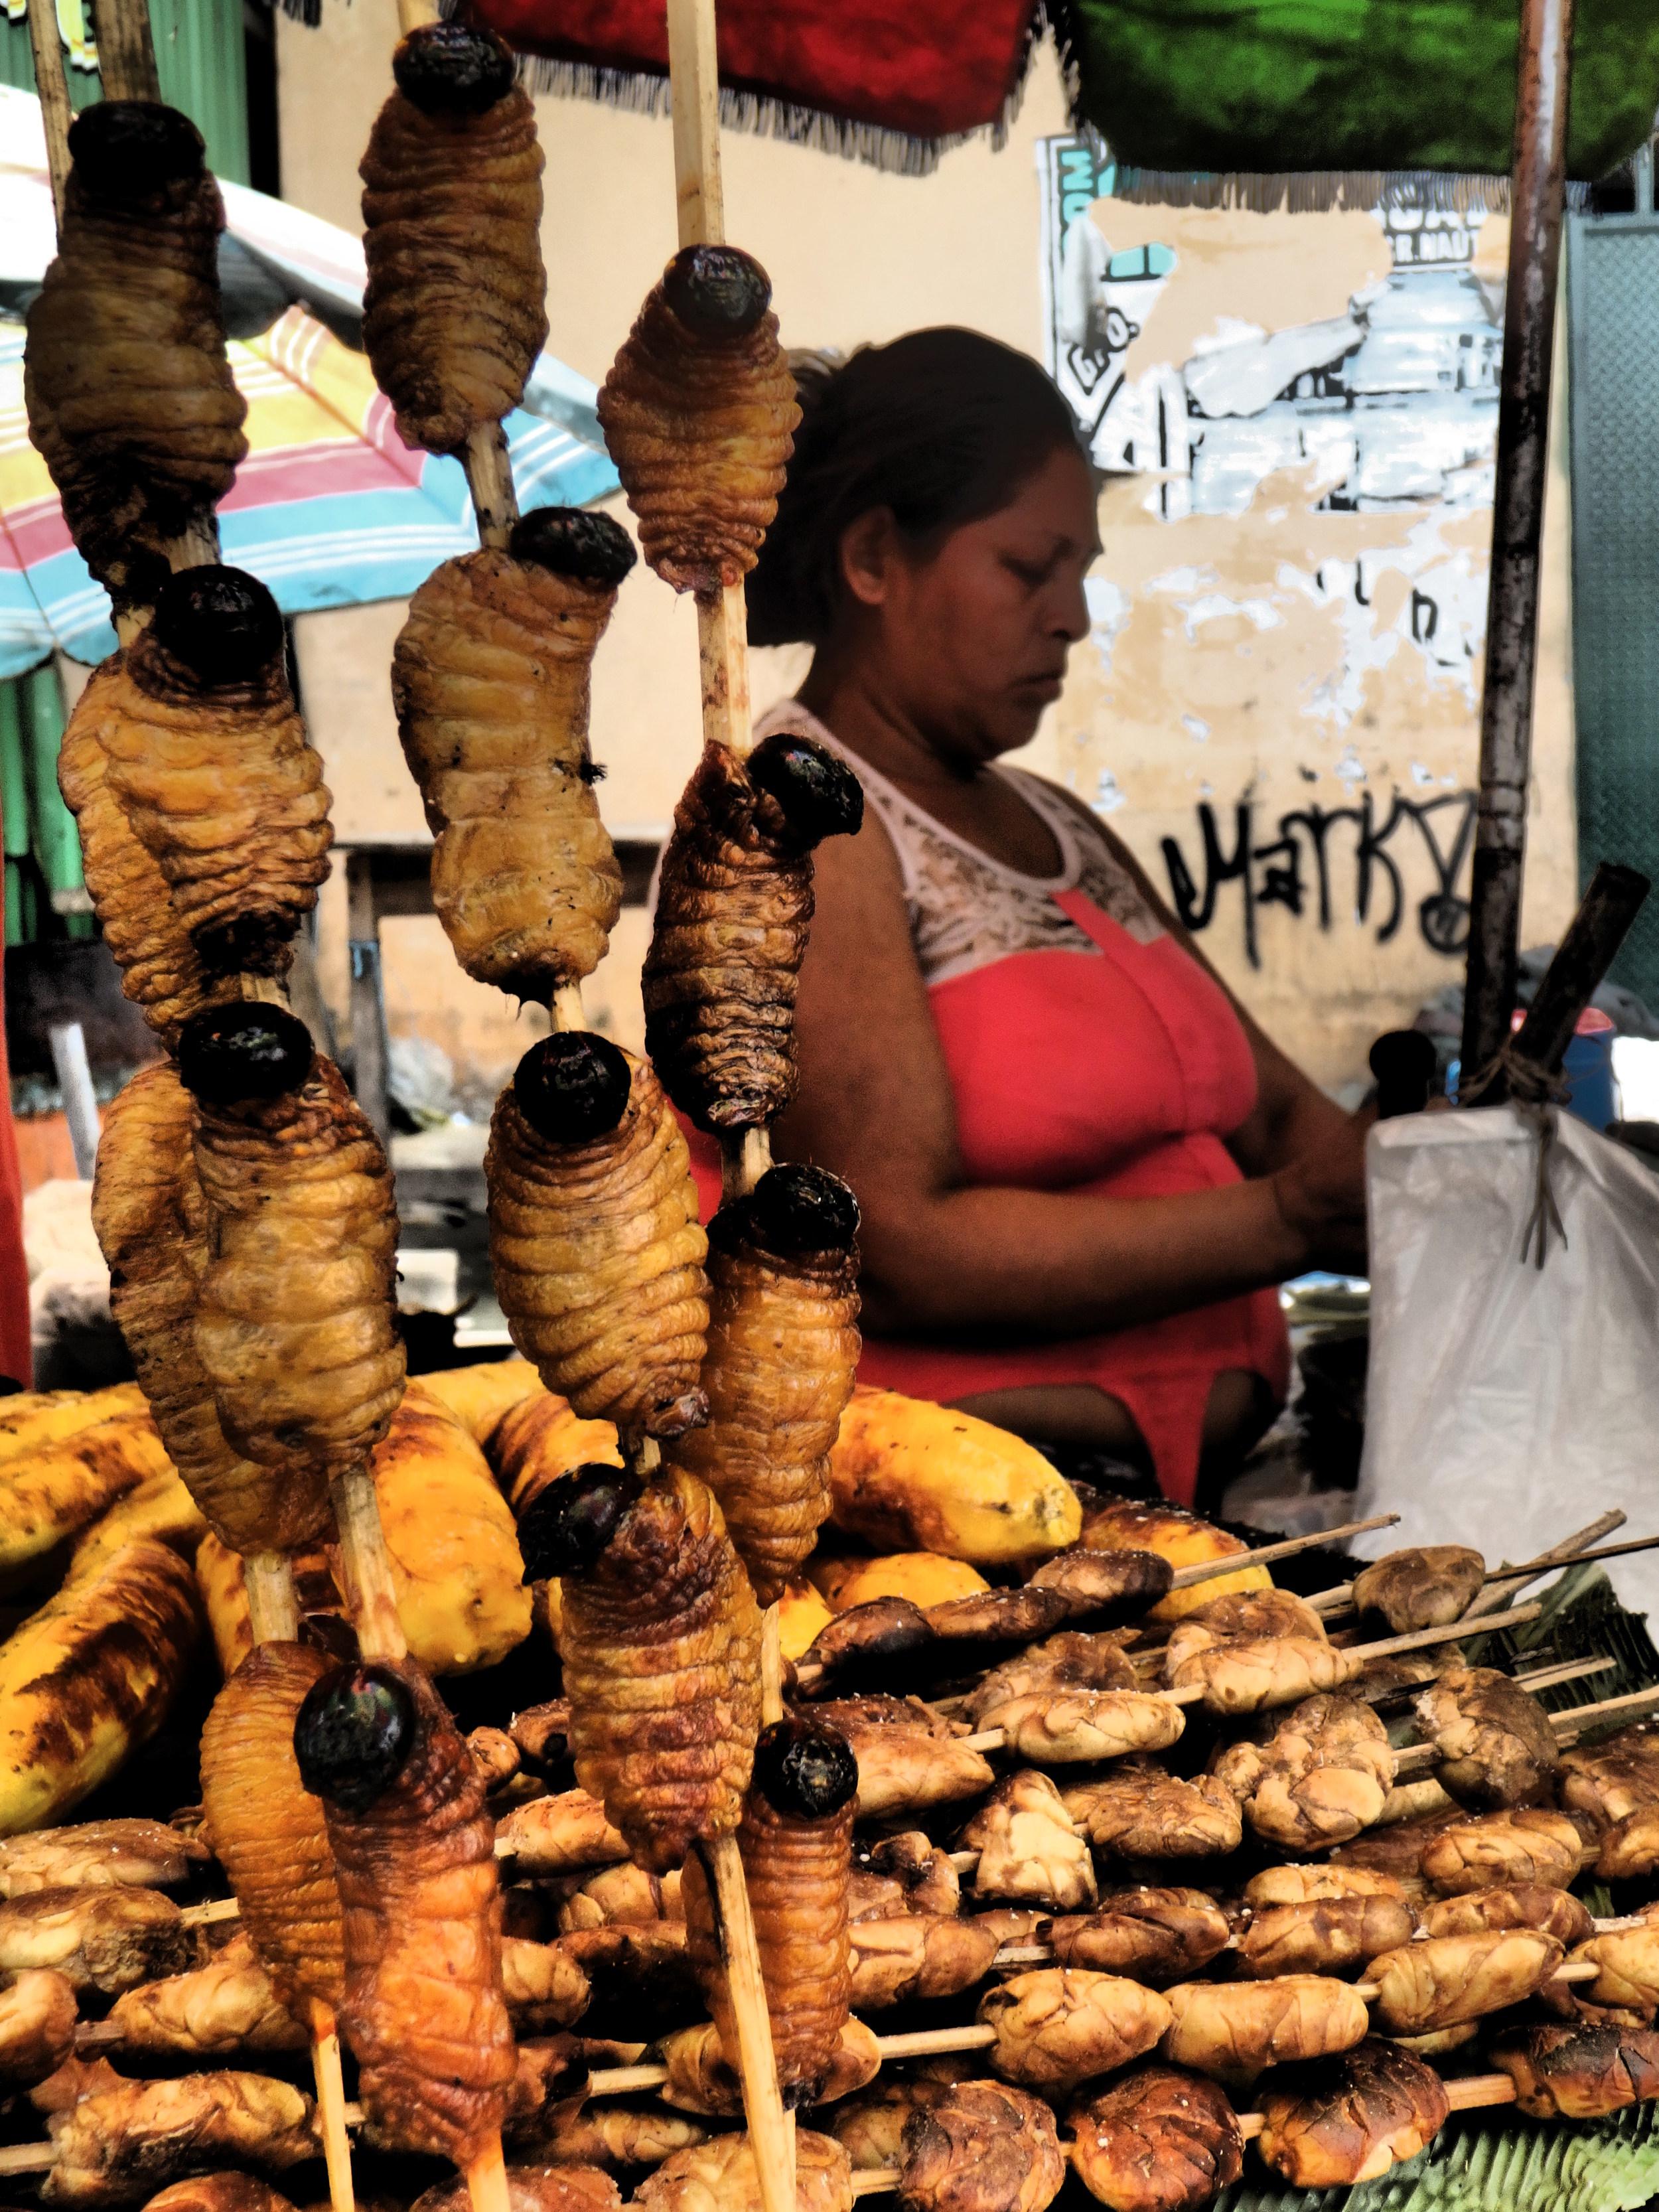 Peru_Iquitos_Amazon 2.JPG